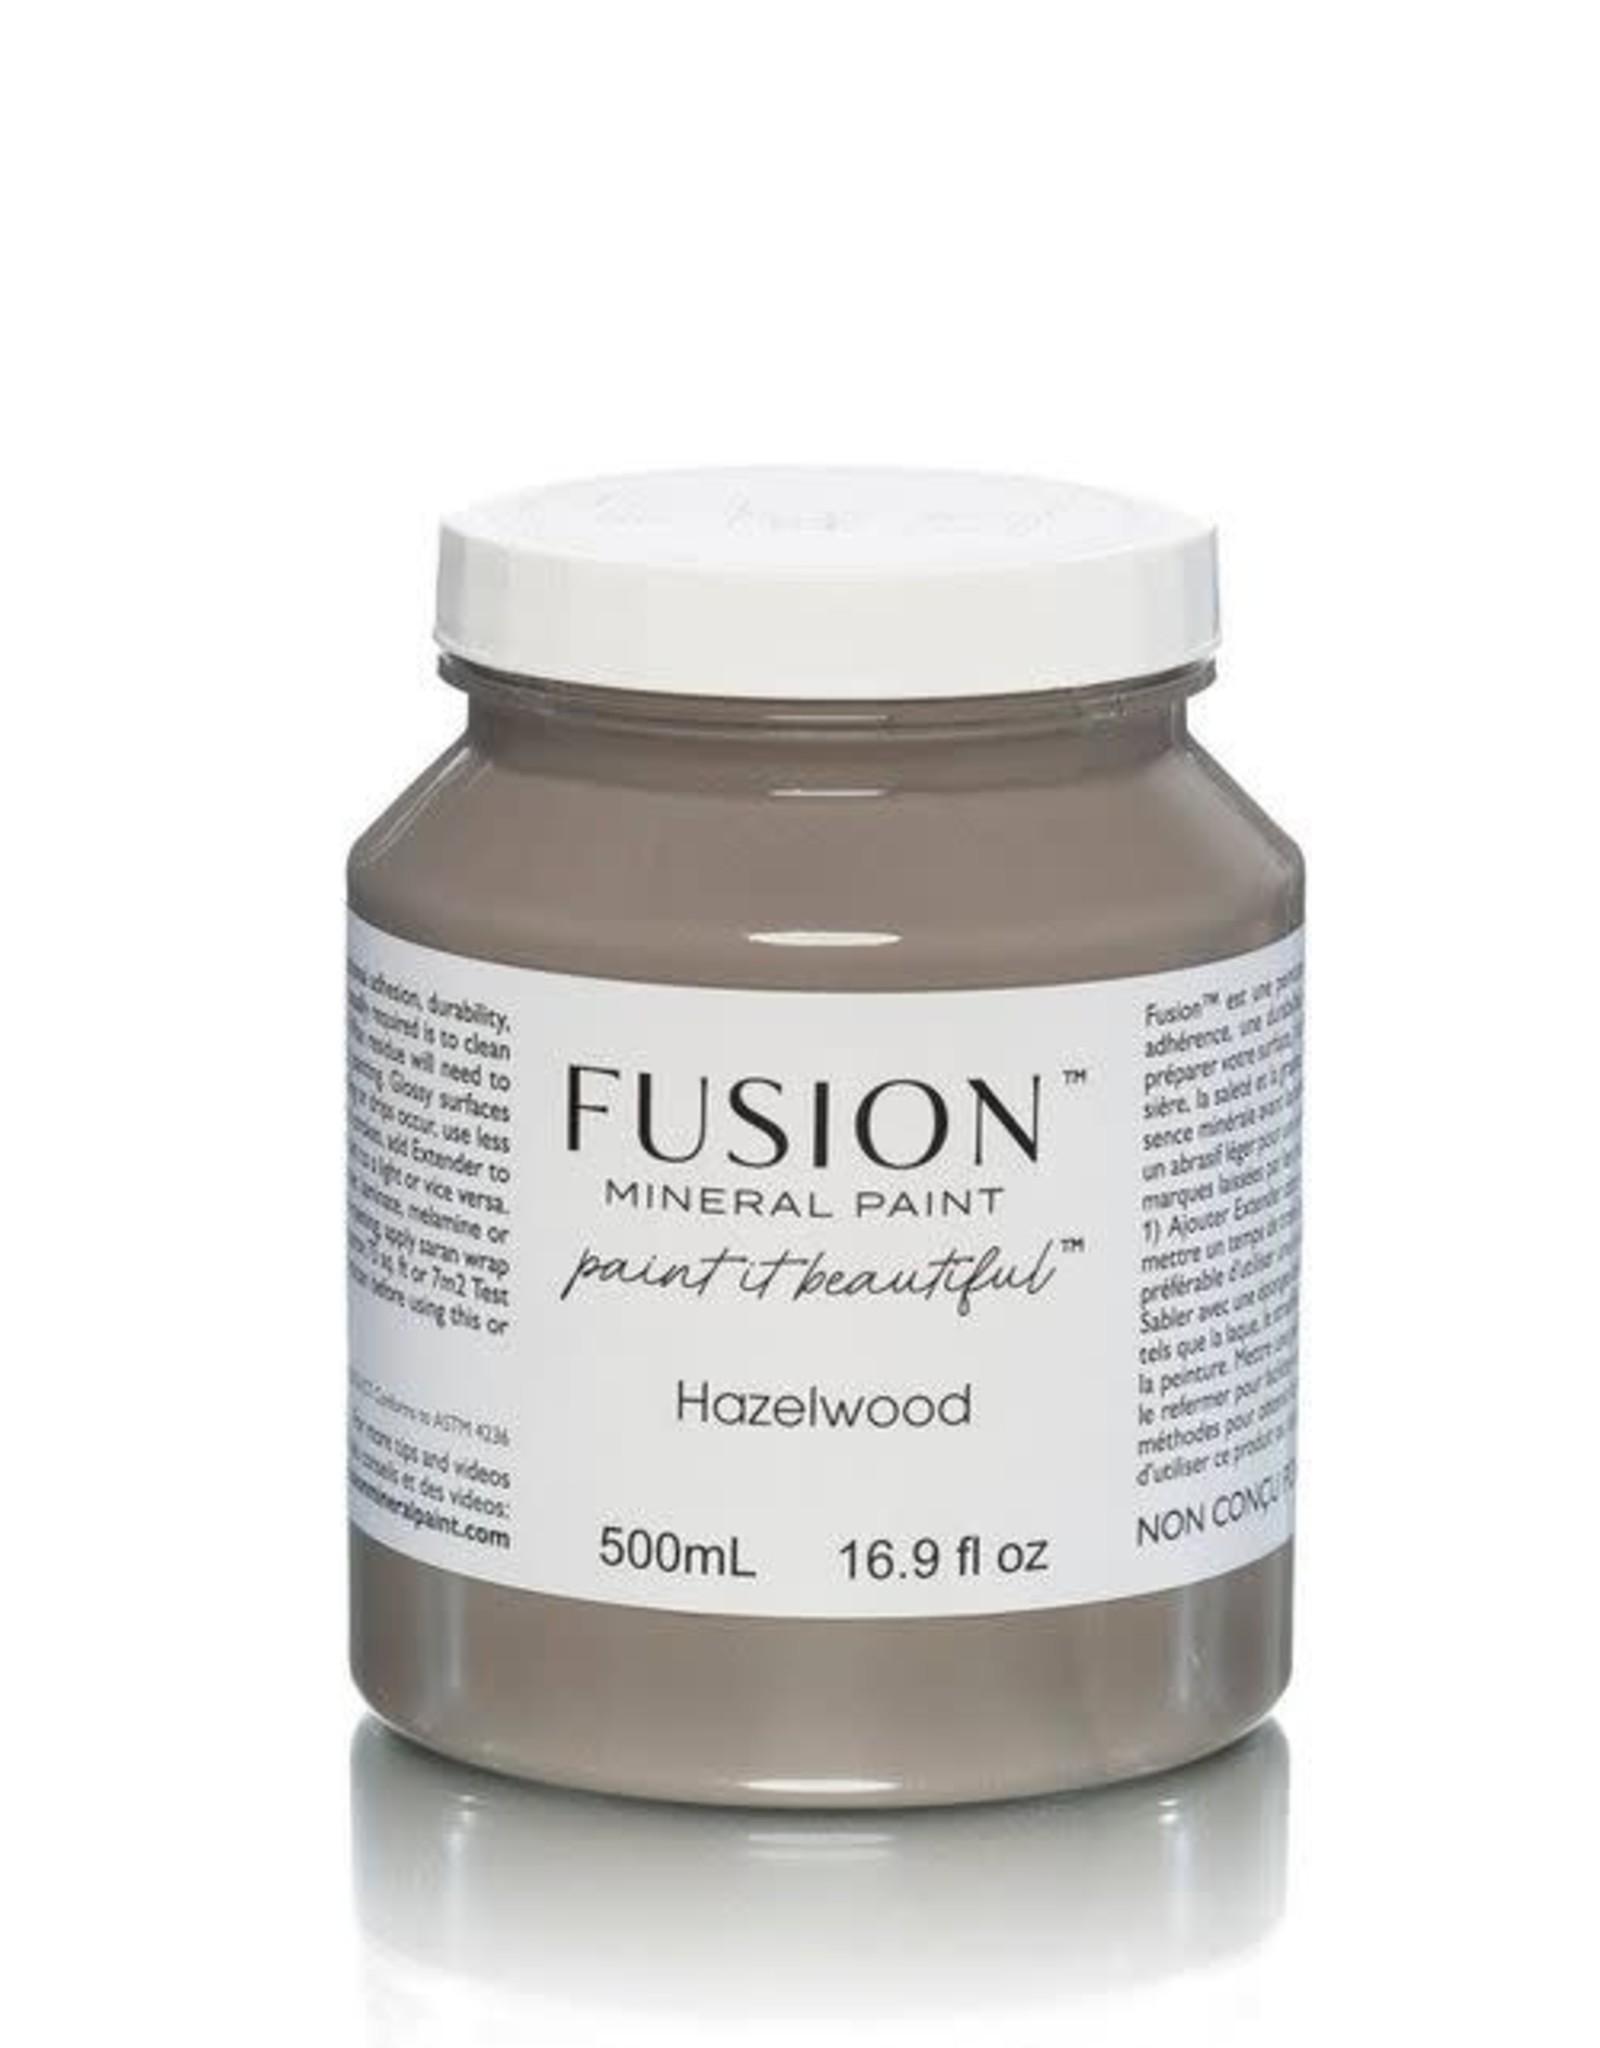 Fusion Mineral Paint Fusion Mineral Paint - Hazelwood 500ml